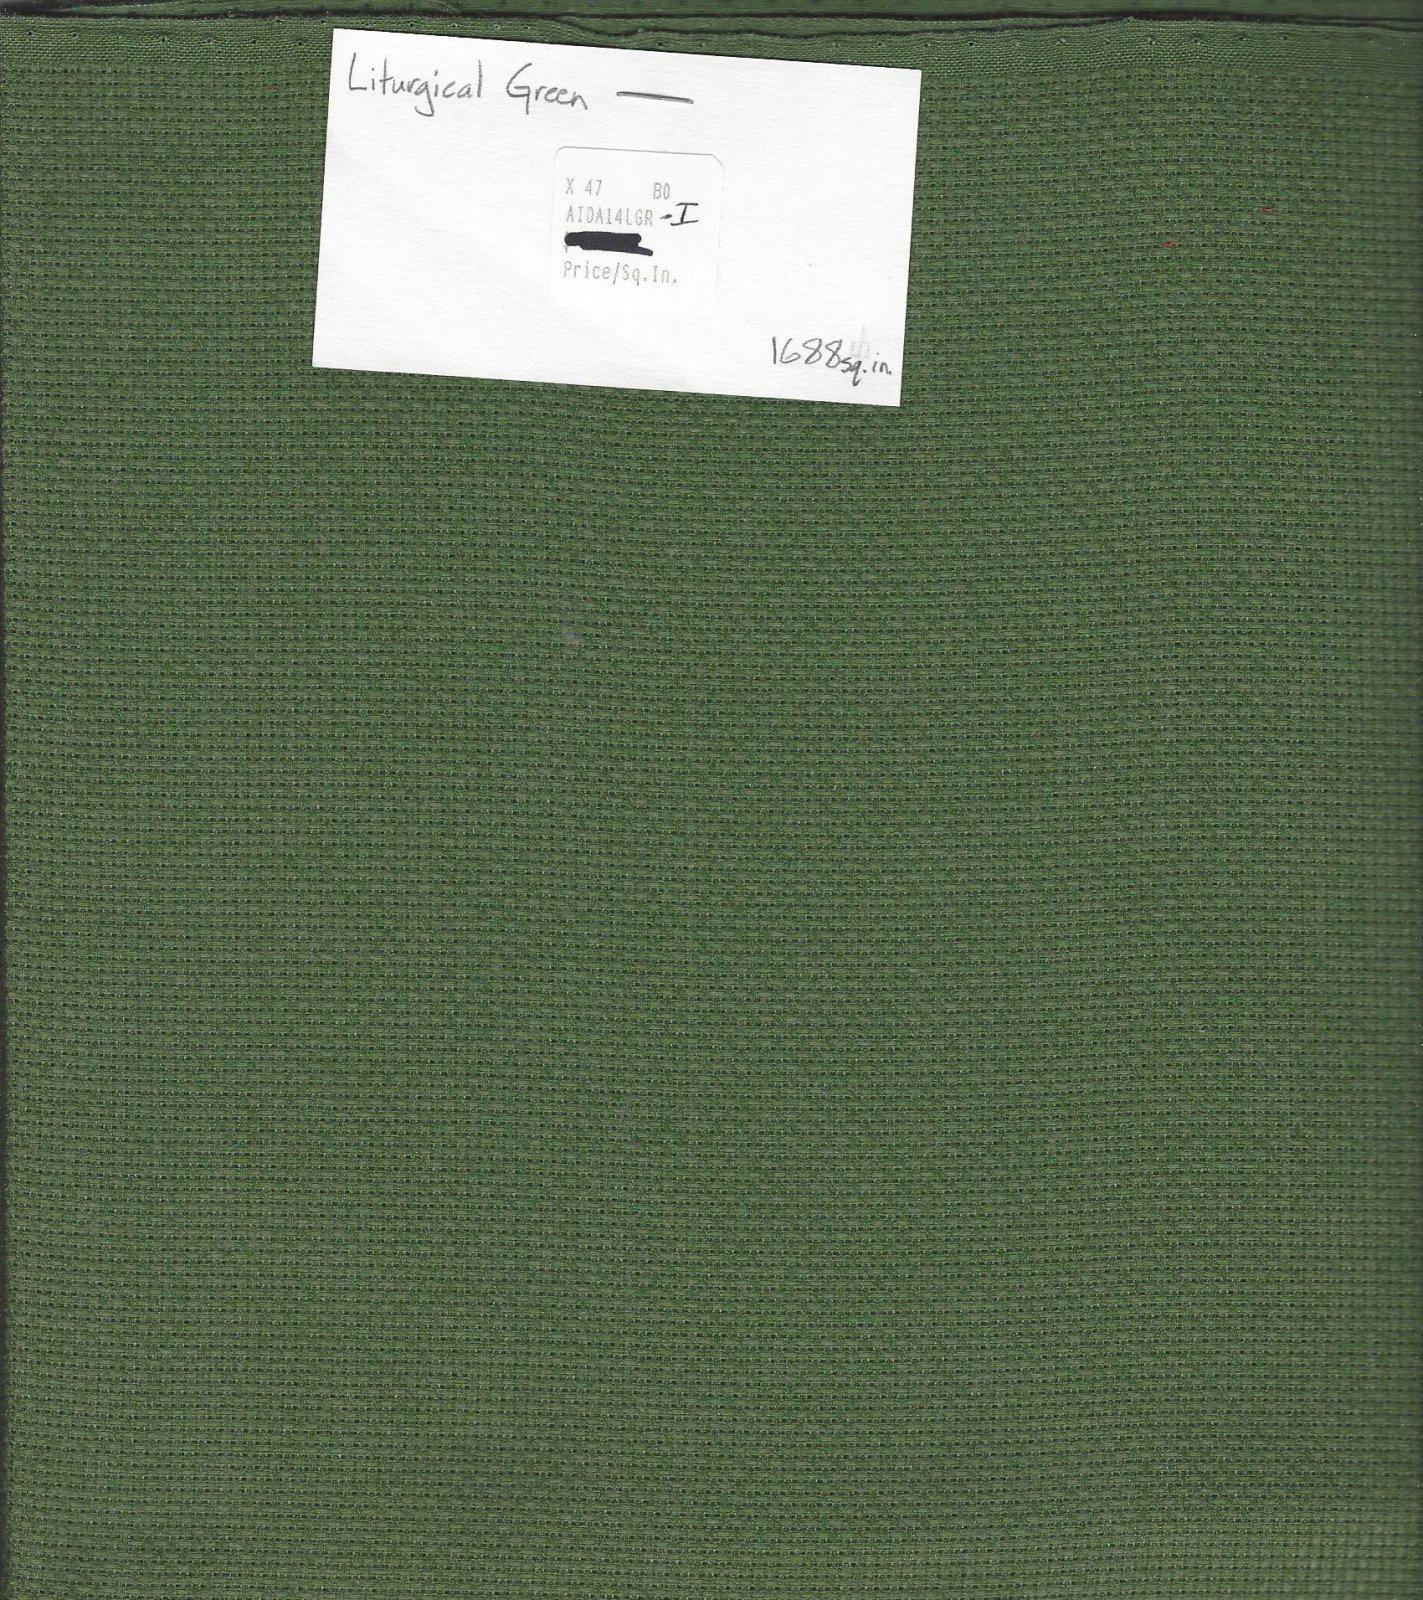 Aida 14ct Liturgical Green-I (discontinued color)